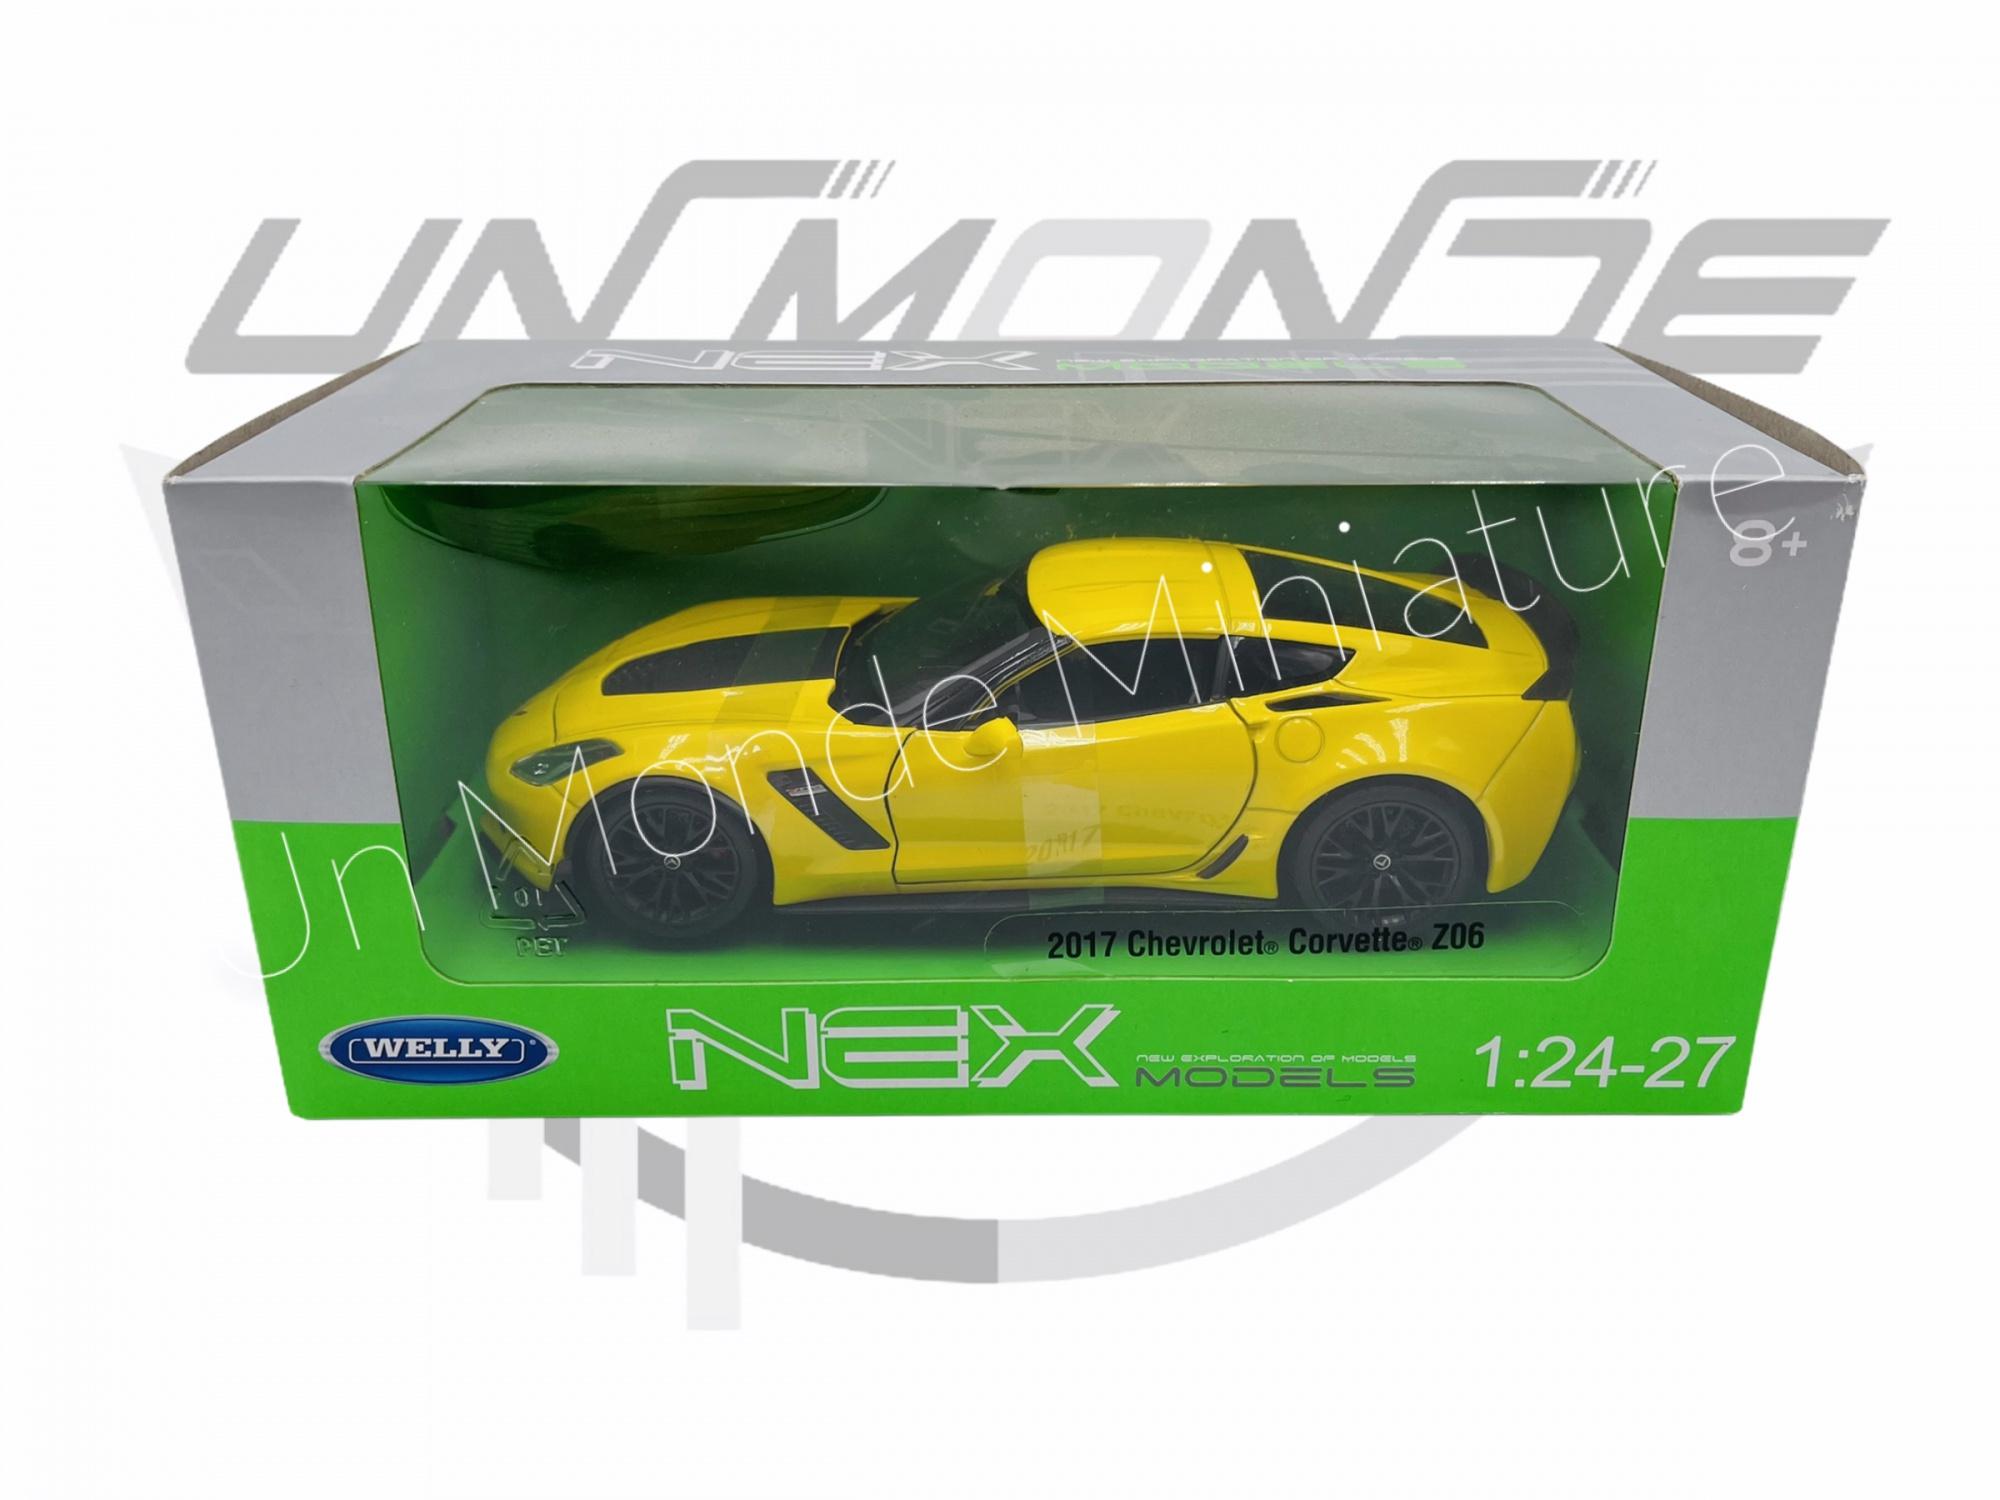 Chevrolet Corvette 2017 C7 Z06 Yellow